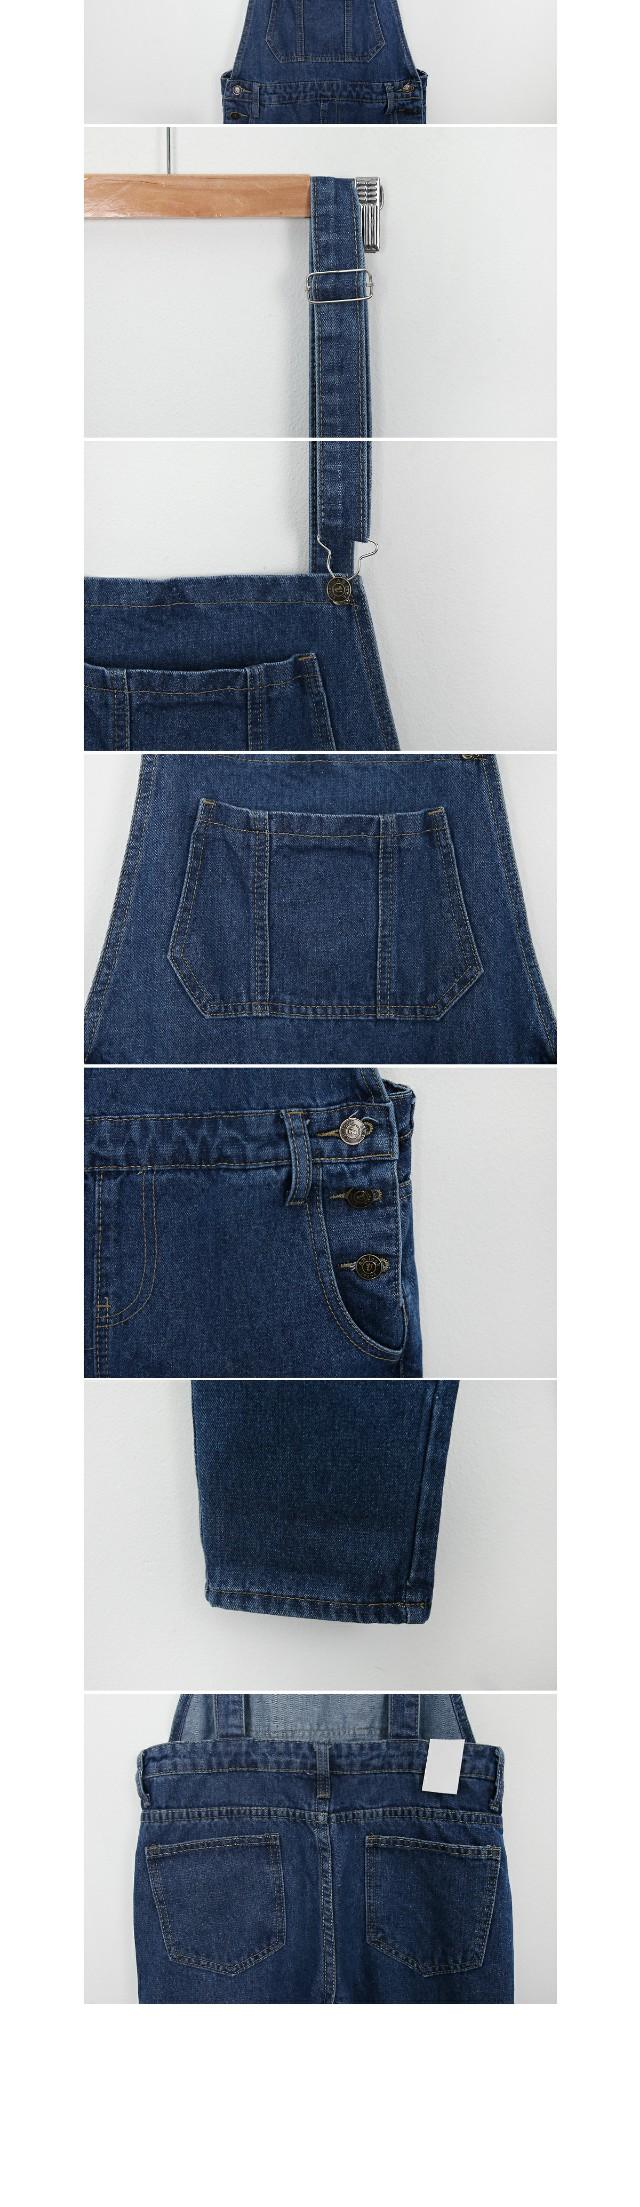 Pops denim suspenders pants